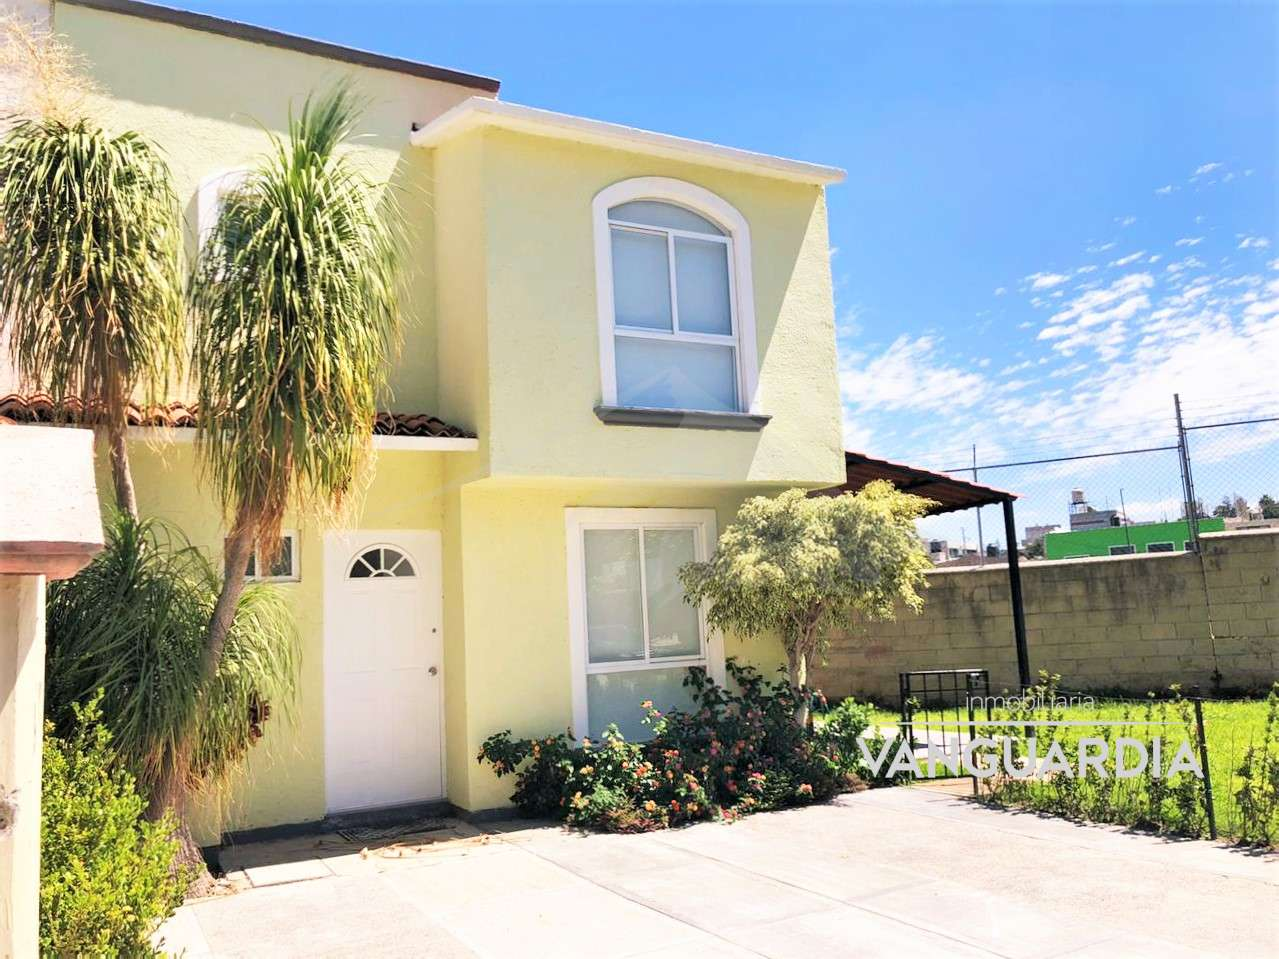 Casa en venta totalmente remodelada con acabados premium y excelente ubicación. – Querétaro | Candiles